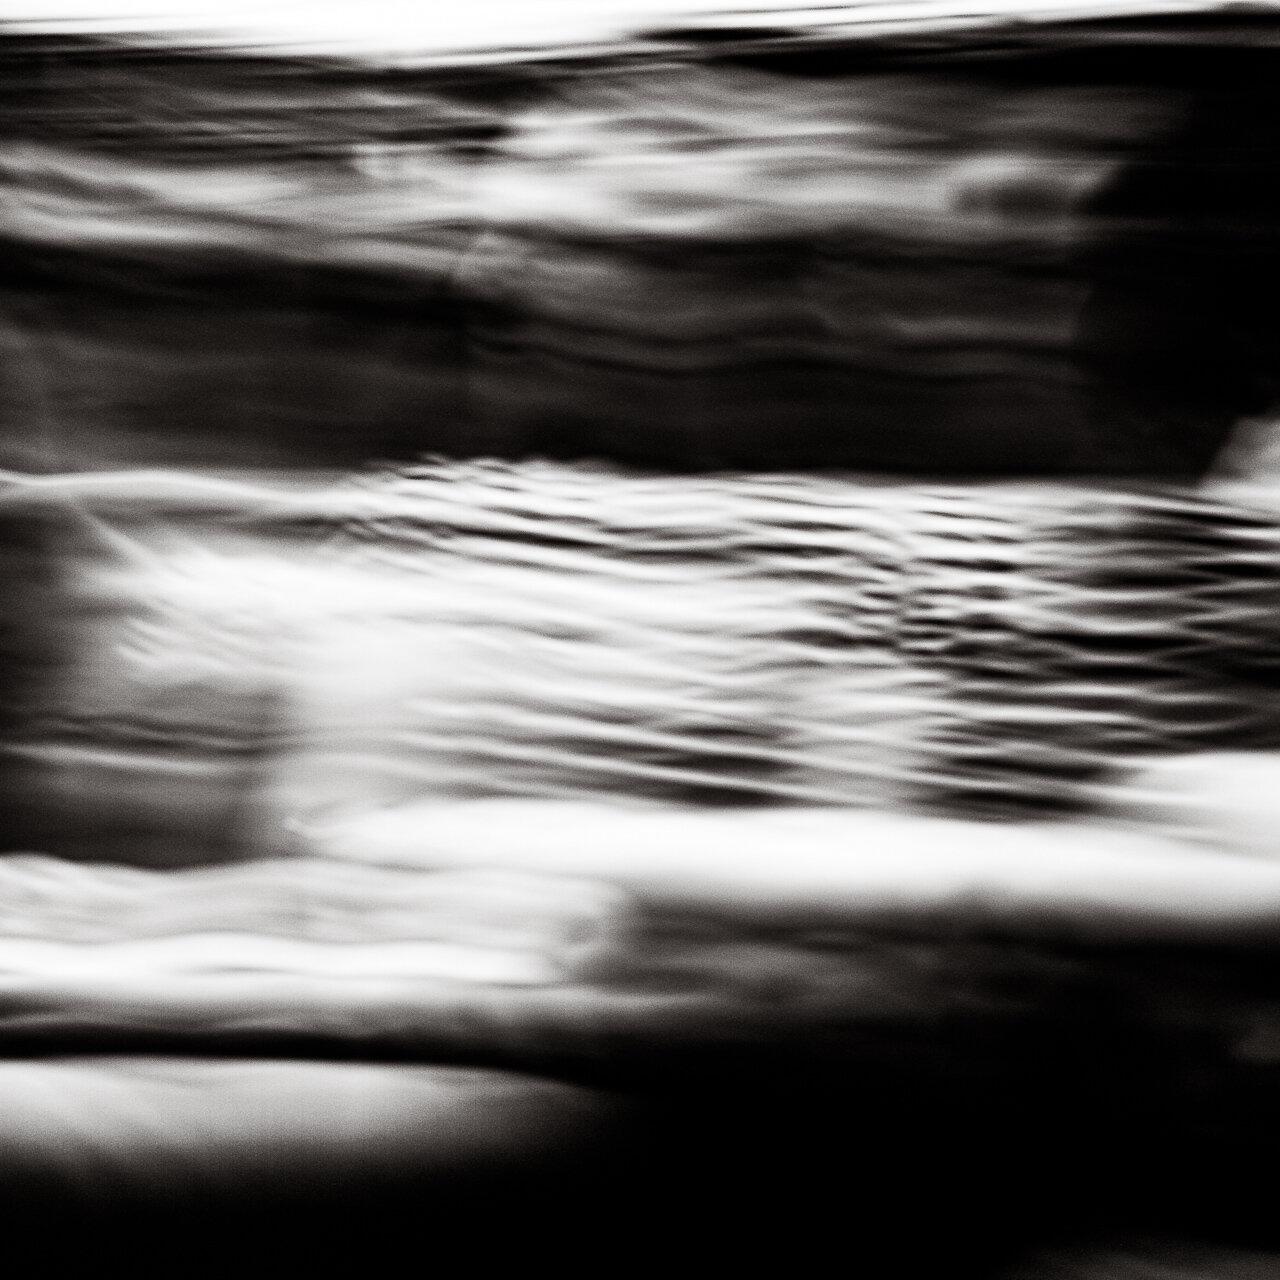 USA, New york, America, Amerika, streetphotography, Straßenfotofotografie, street, Straße, Alltag, everyday life, photo, Foto, photography, Fotografie, people, Menschen - bondarenko-ps_de+00026+_P2M5036.jpg